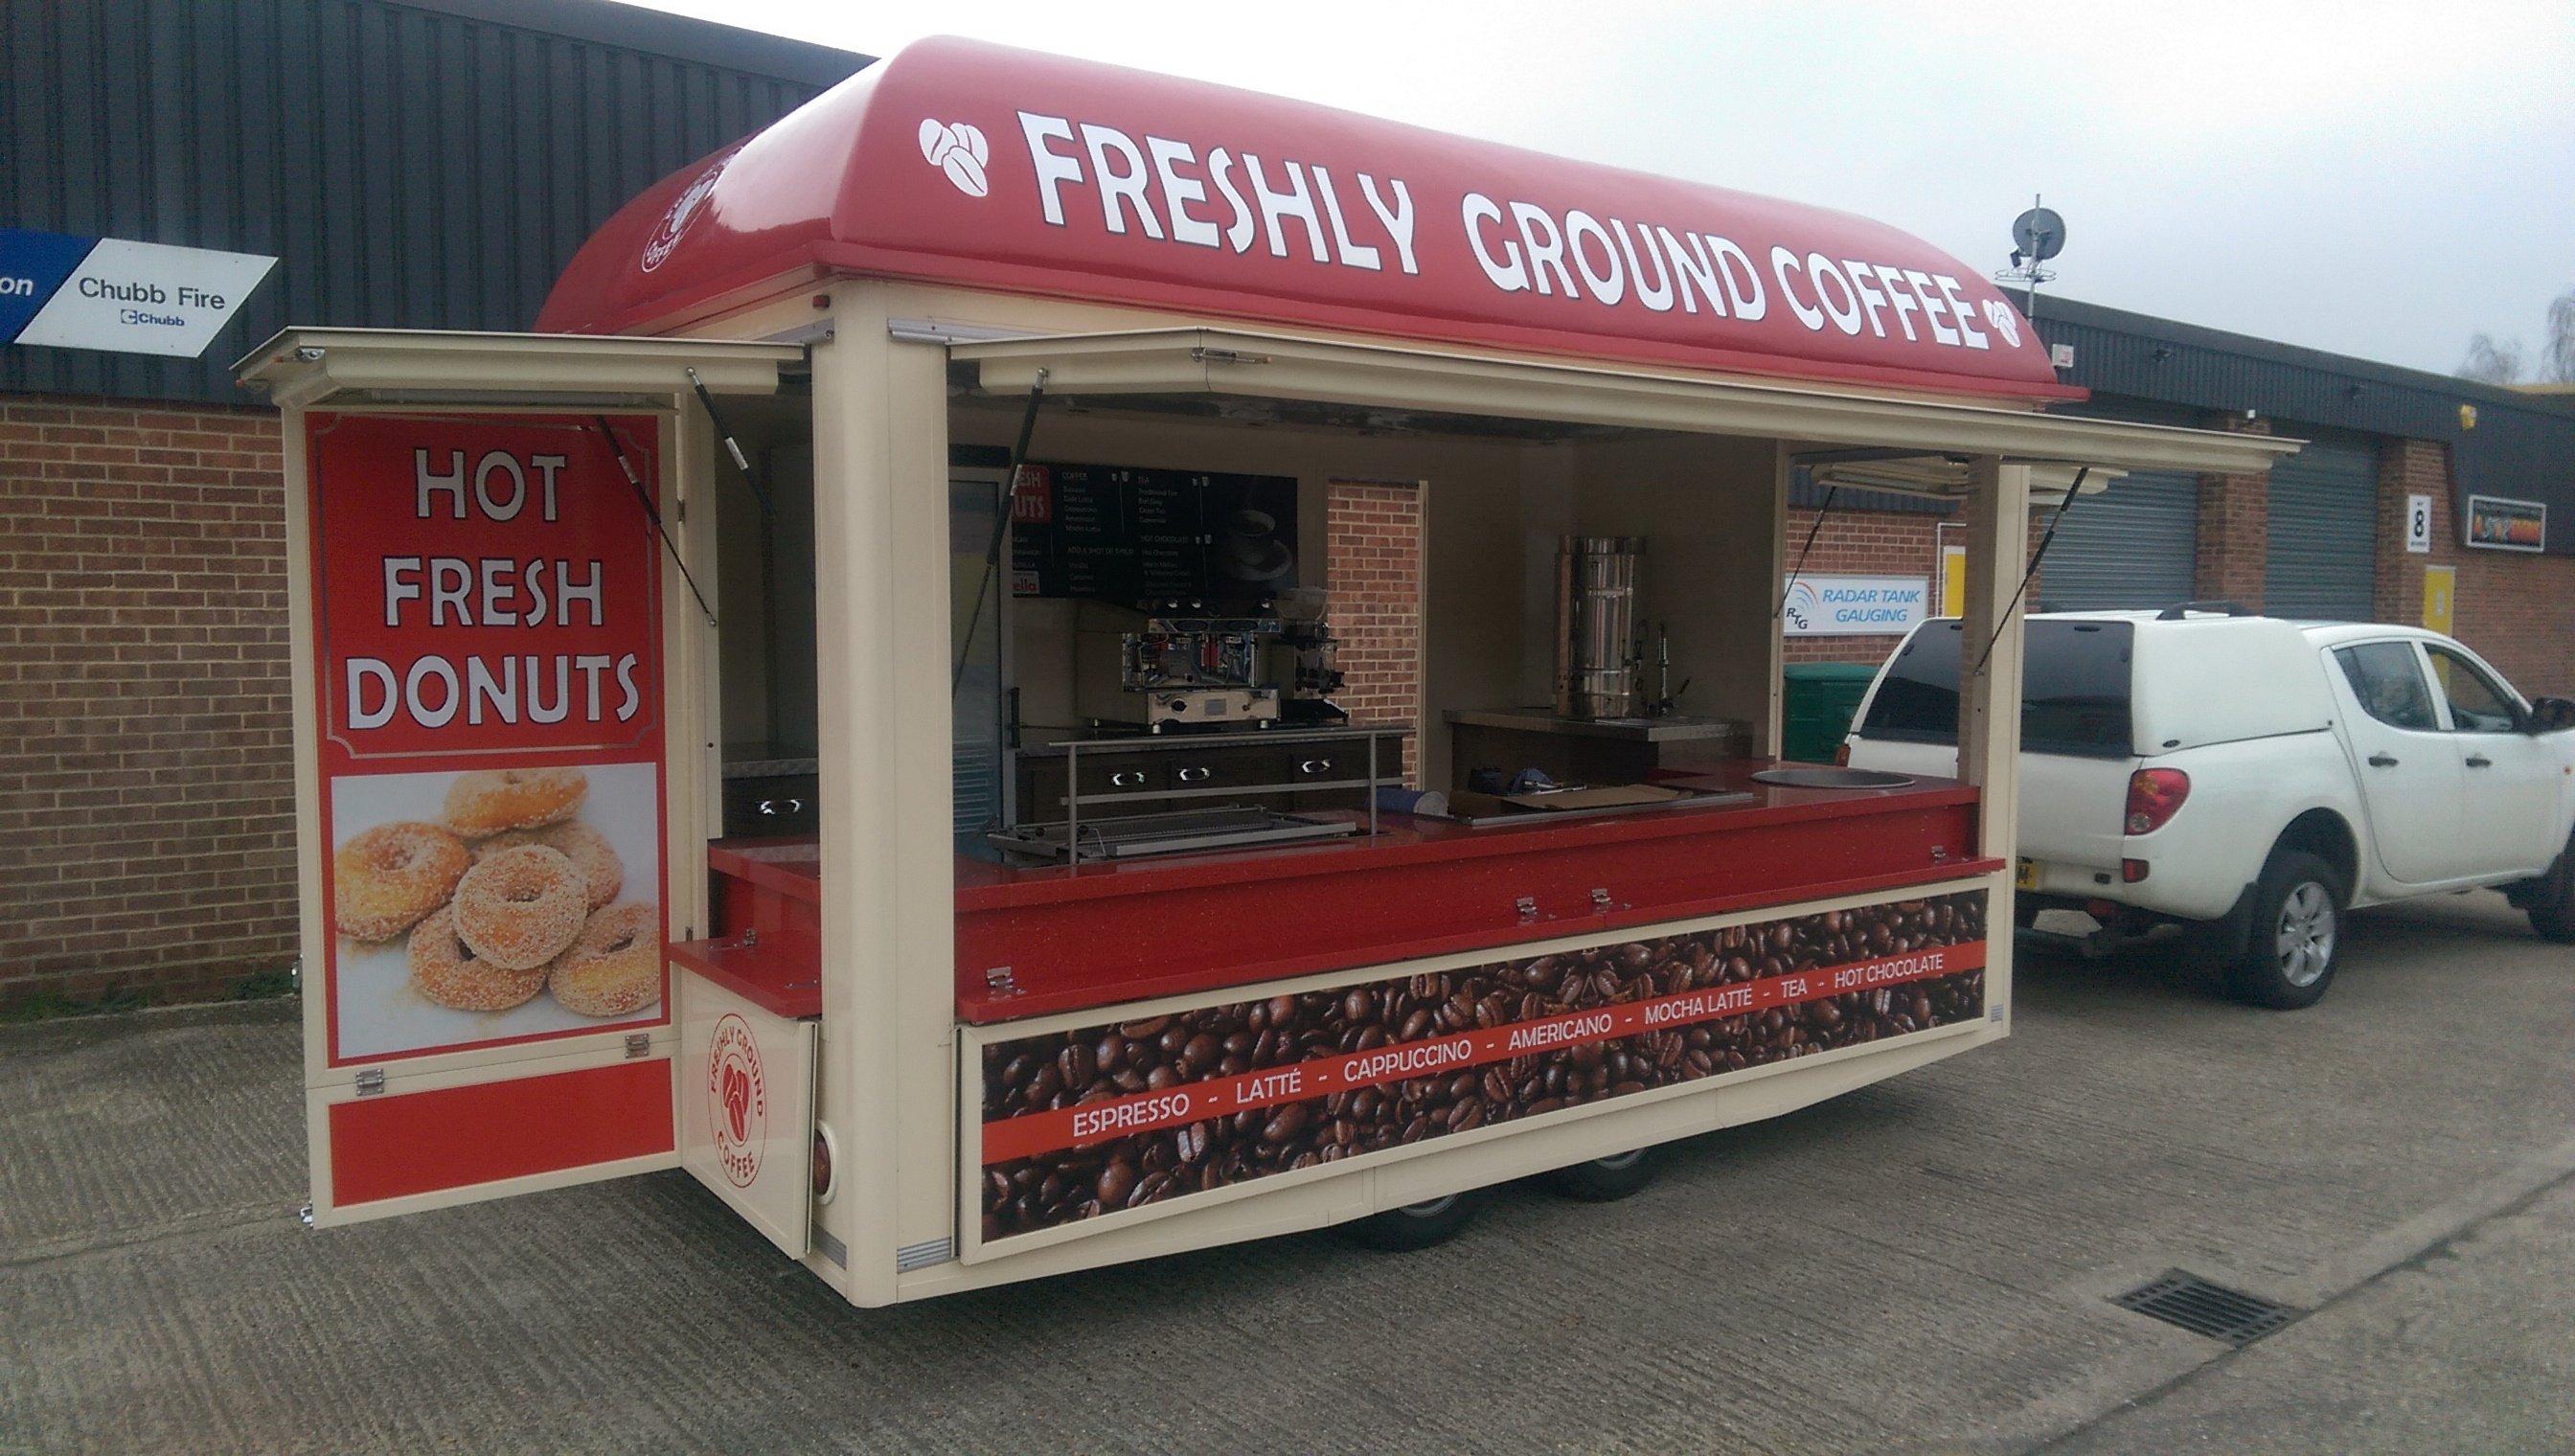 Freshly ground coffee shop